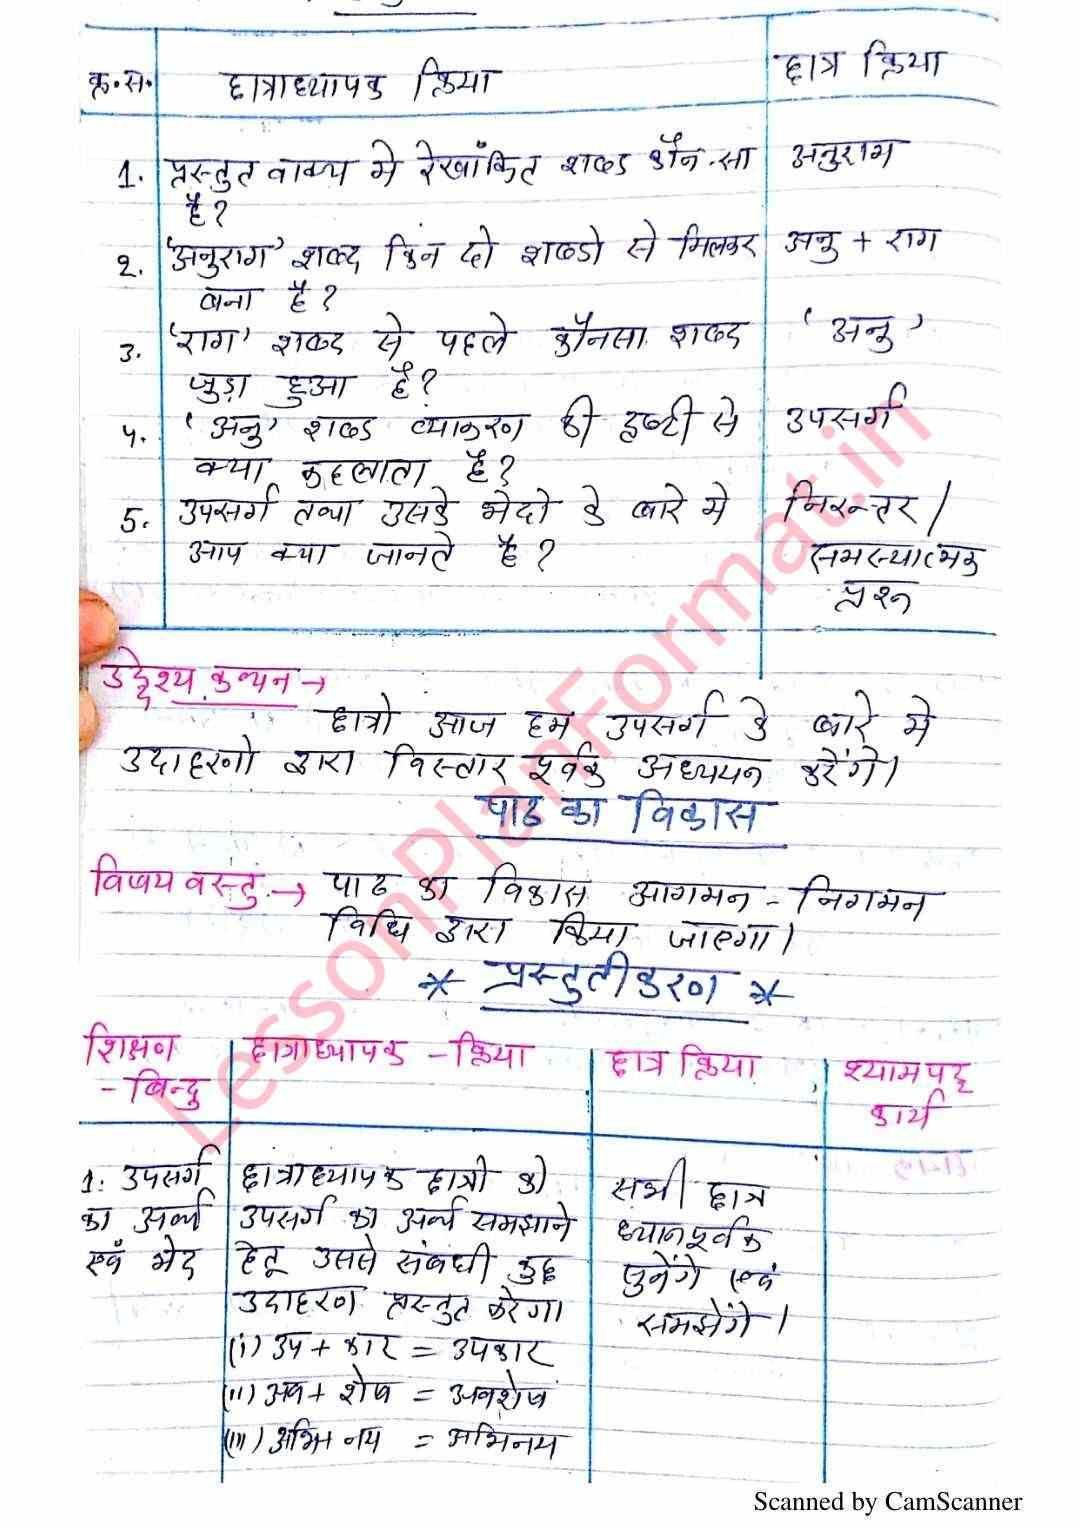 Hindi Vyakaran Upsarg Class 6 Lesson Plan Lesson Plan Format Lesson Plan In Hindi Teacher Lesson Plans [ 1528 x 1080 Pixel ]